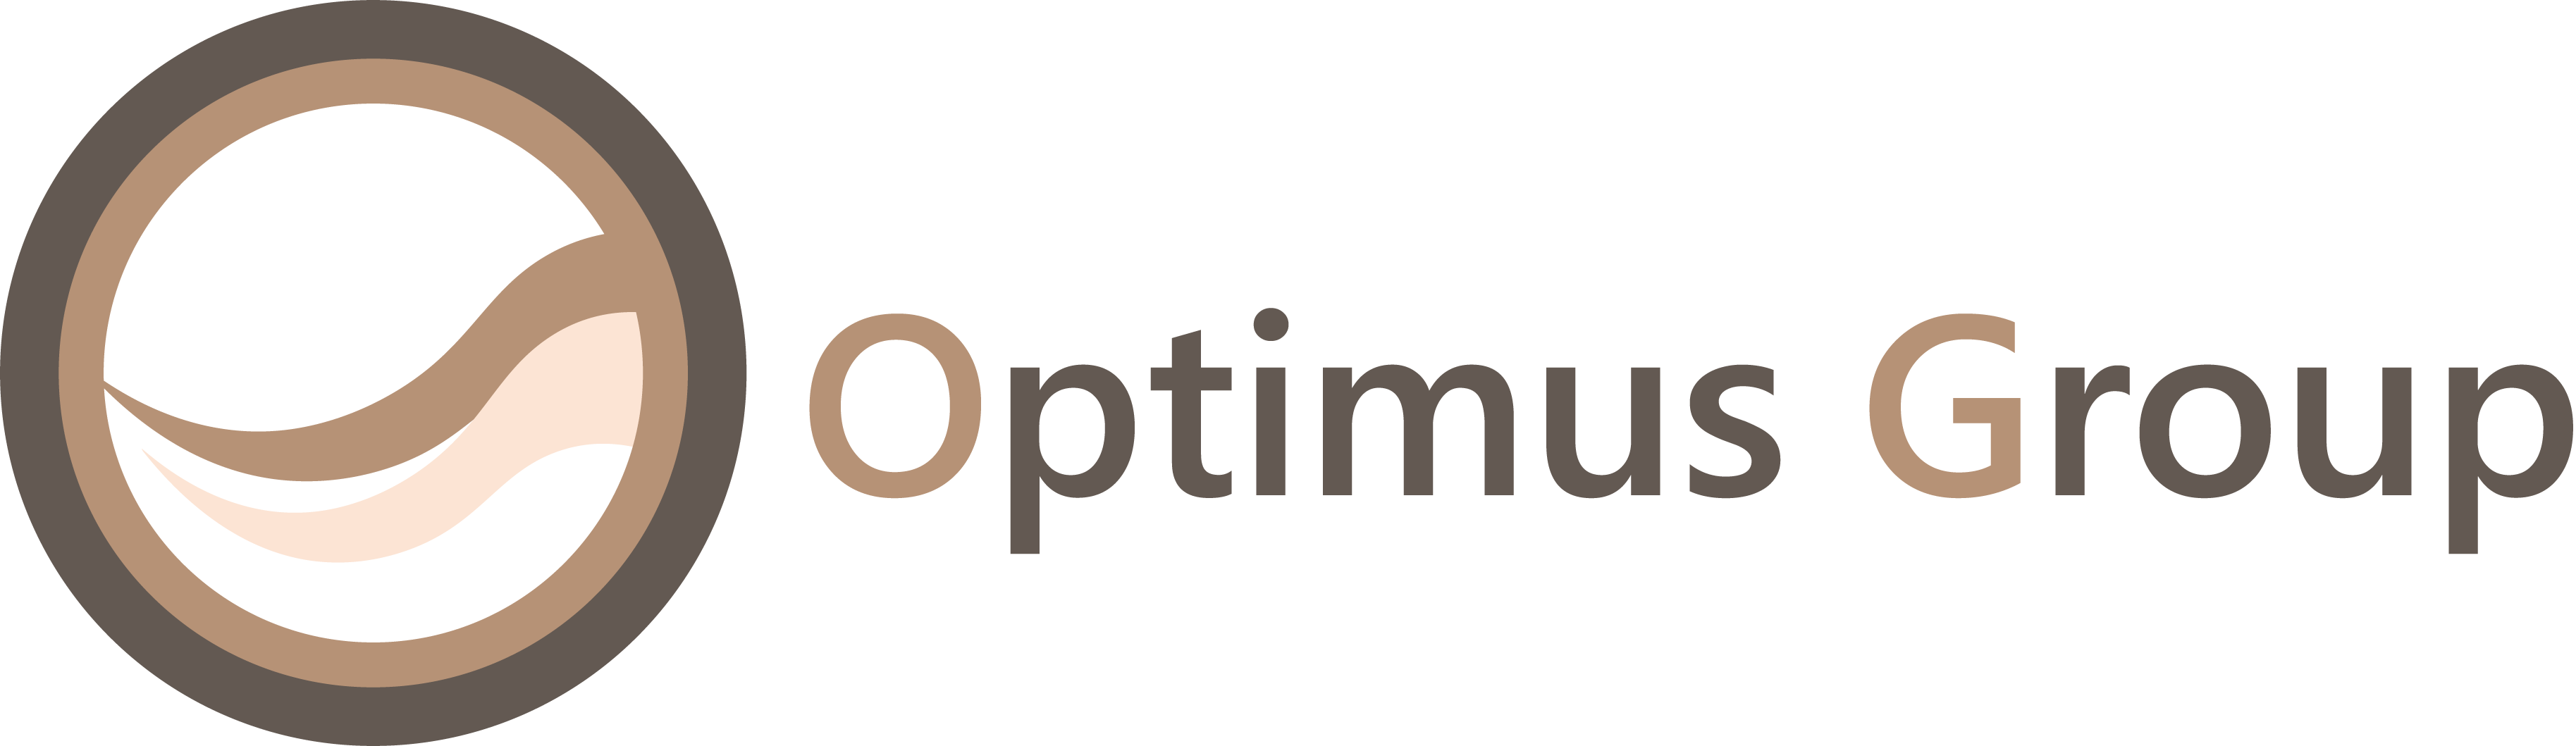 Optimus Group